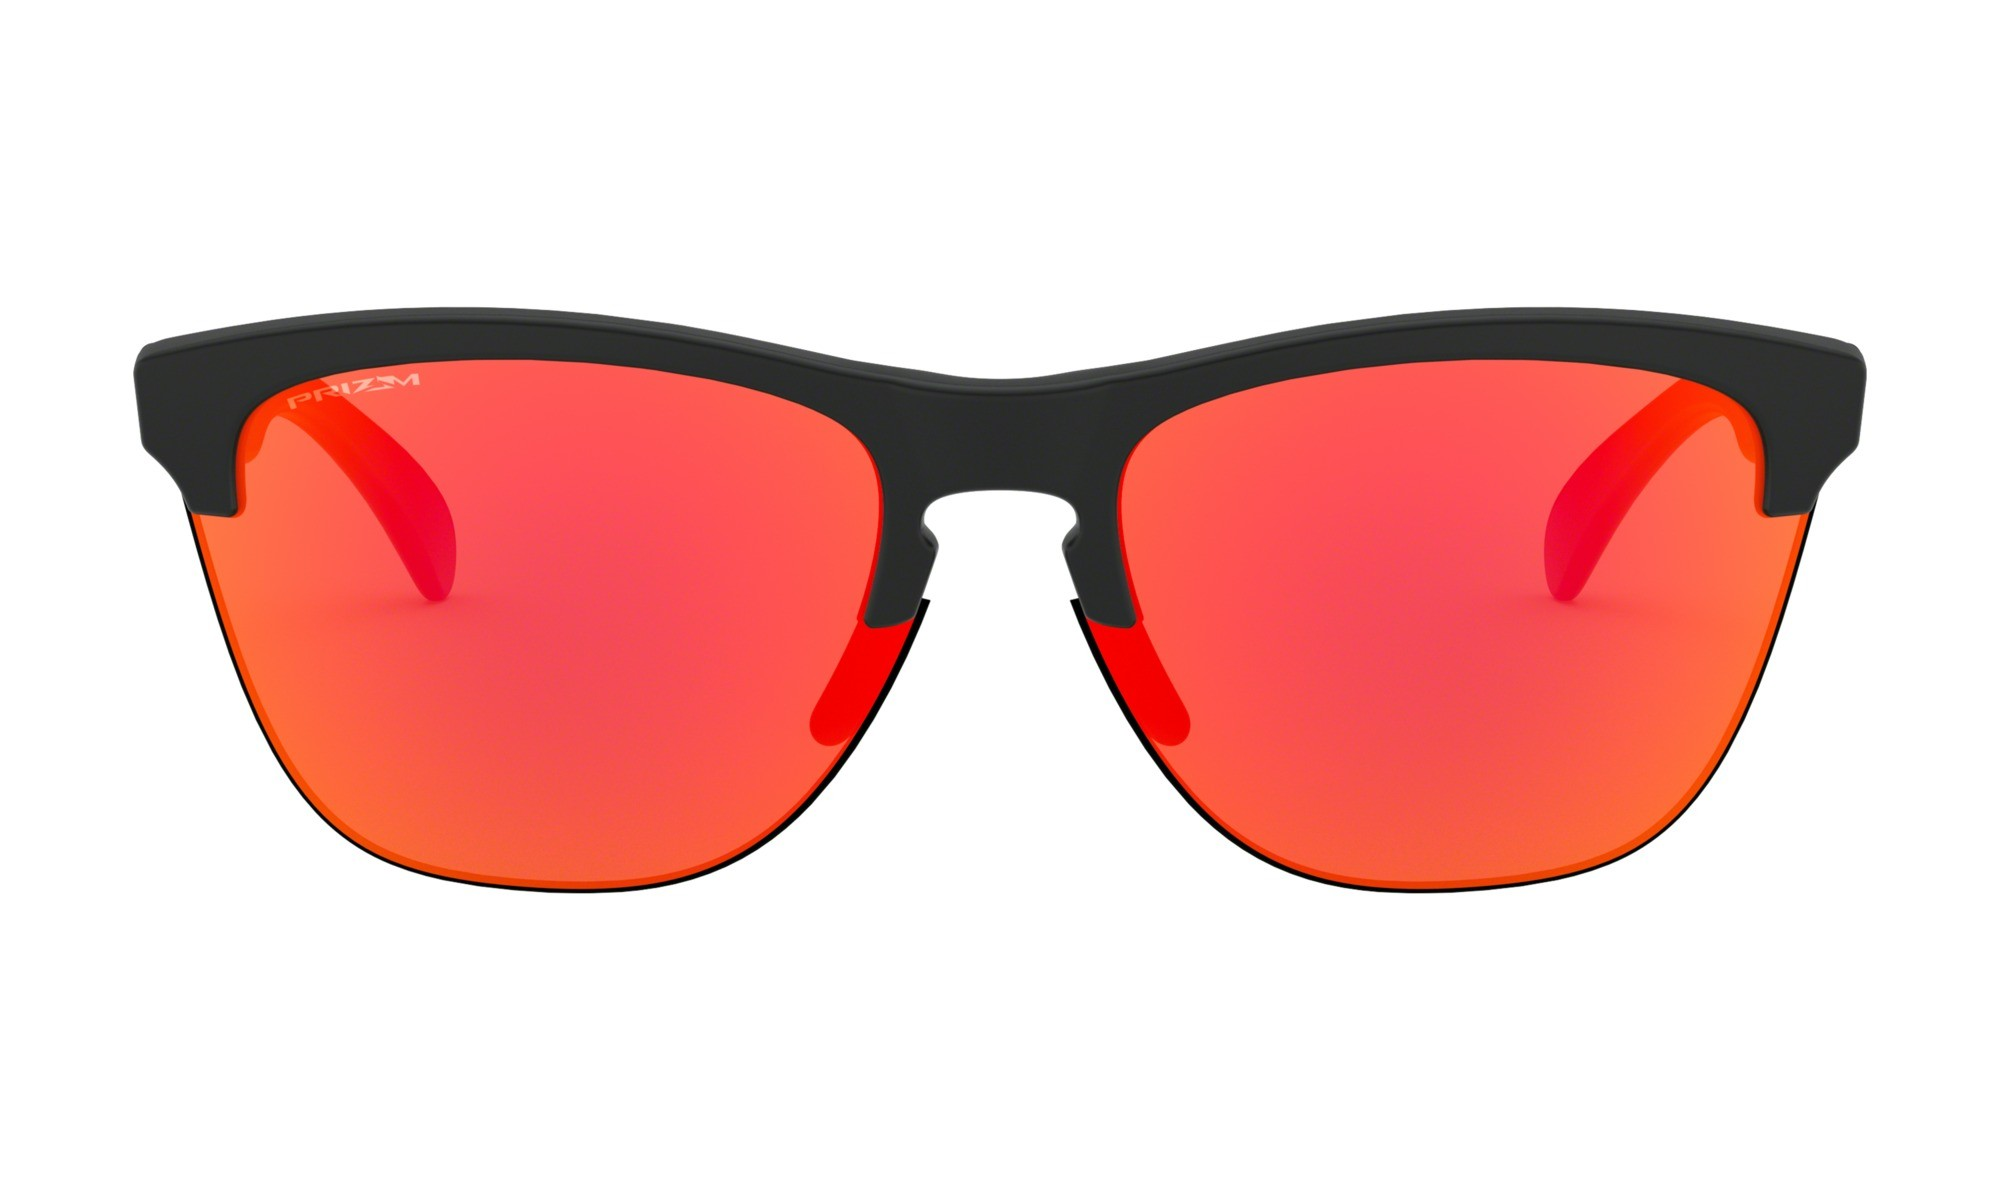 ed4725ddc98 Oakley Frogskins Lite Matte Black Prizm Ruby Sunglasses